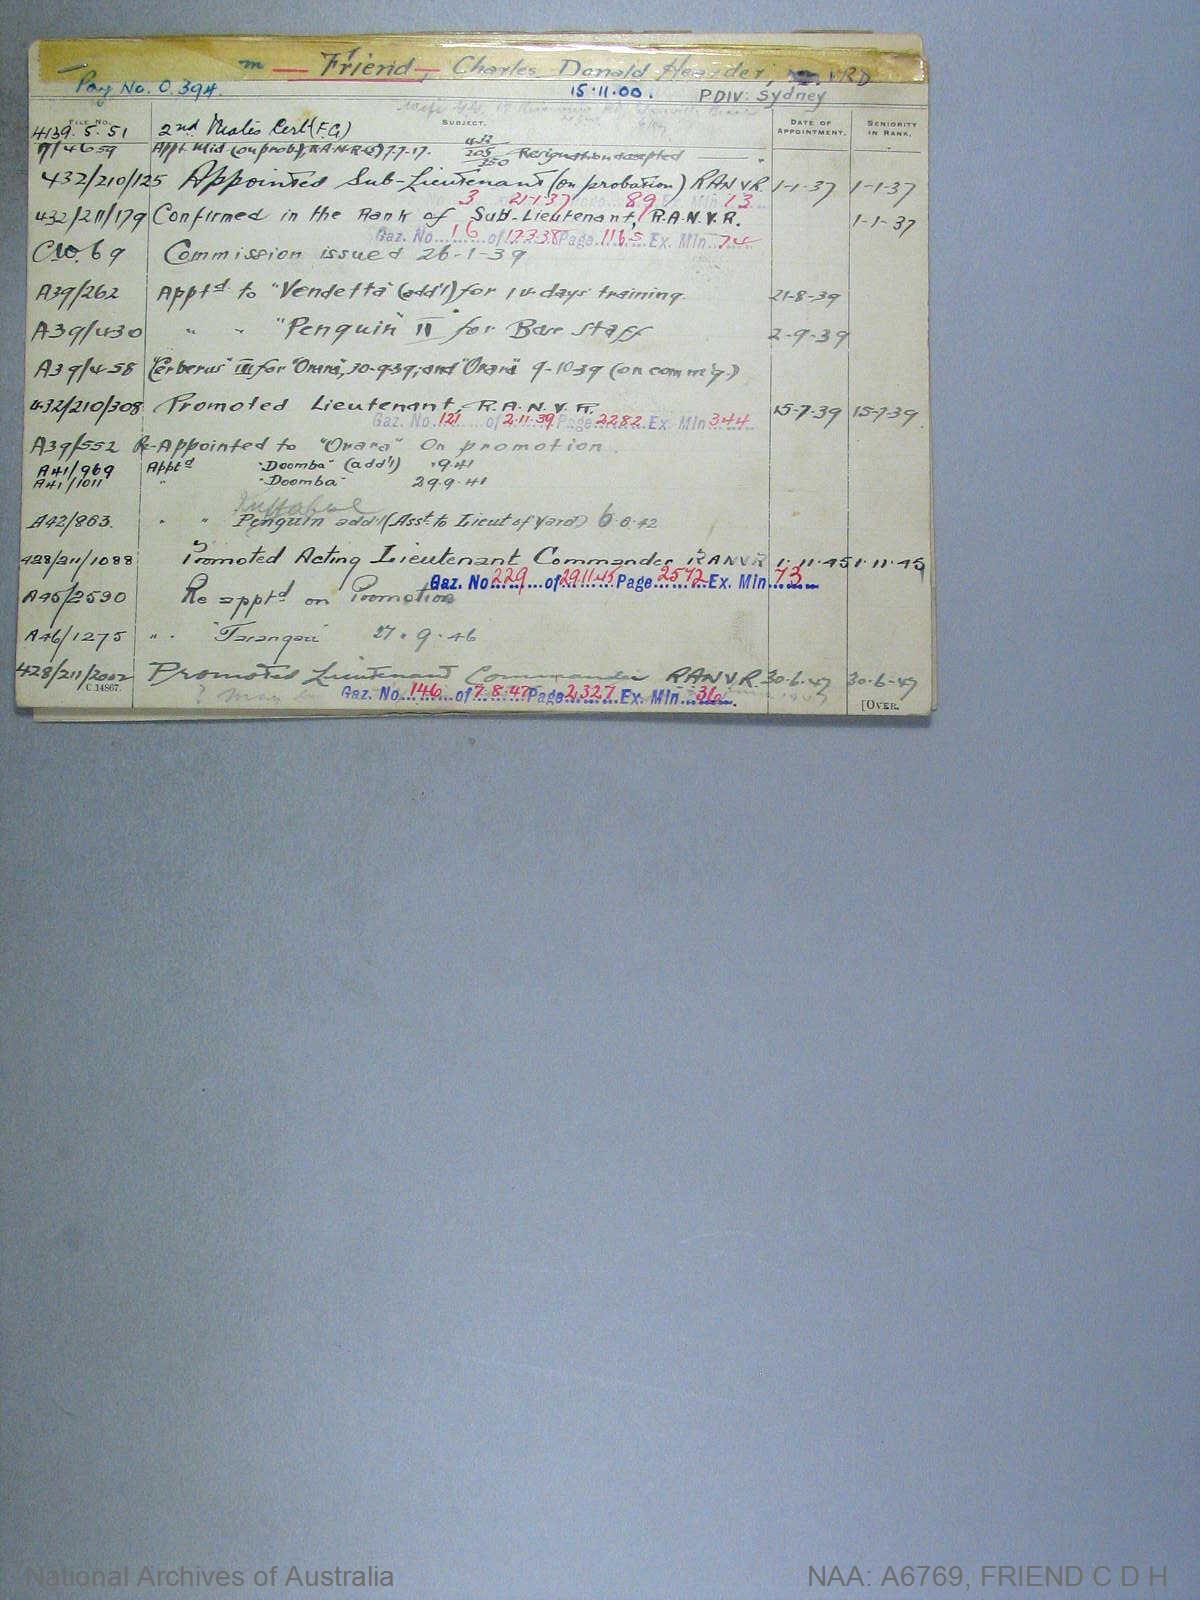 FRIEND CHARLES DONALD HEARDER : Date of birth - 15 Nov 1900 : Place of birth - N SYDNEY NSW : Place of enlistment - SYDNEY : Next of Kin - GWENDOLINE